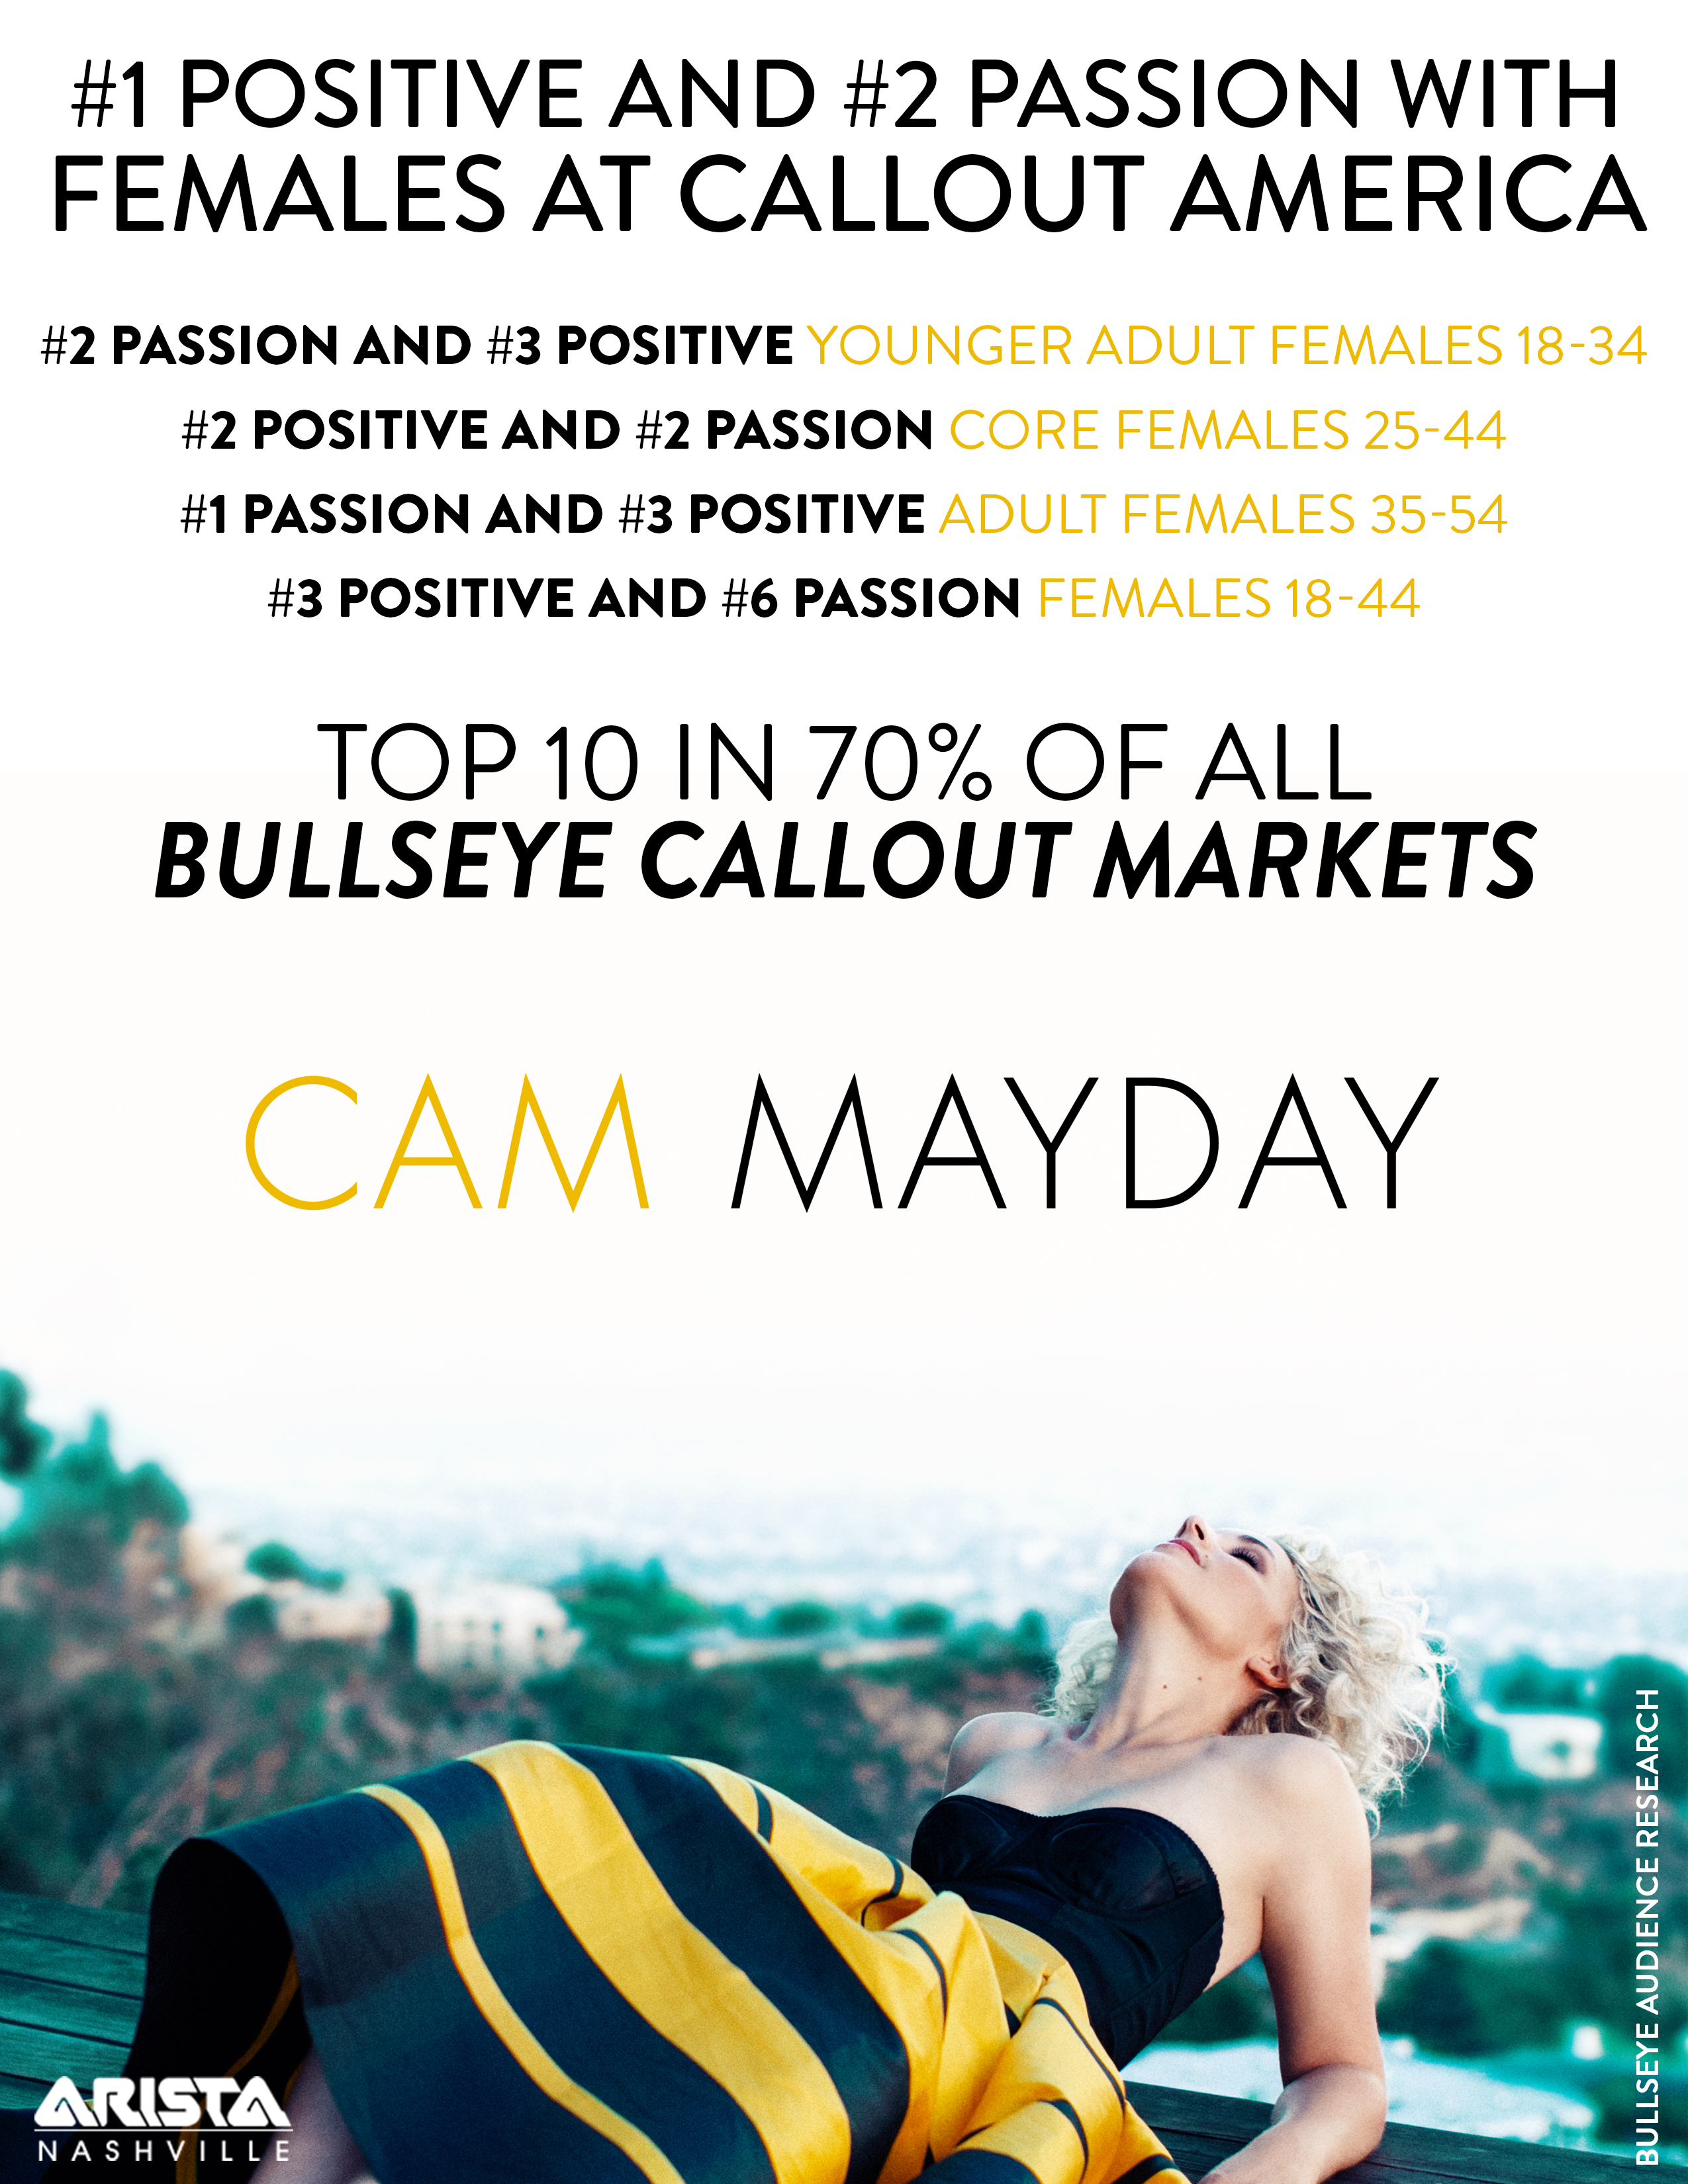 Cam - Mayday